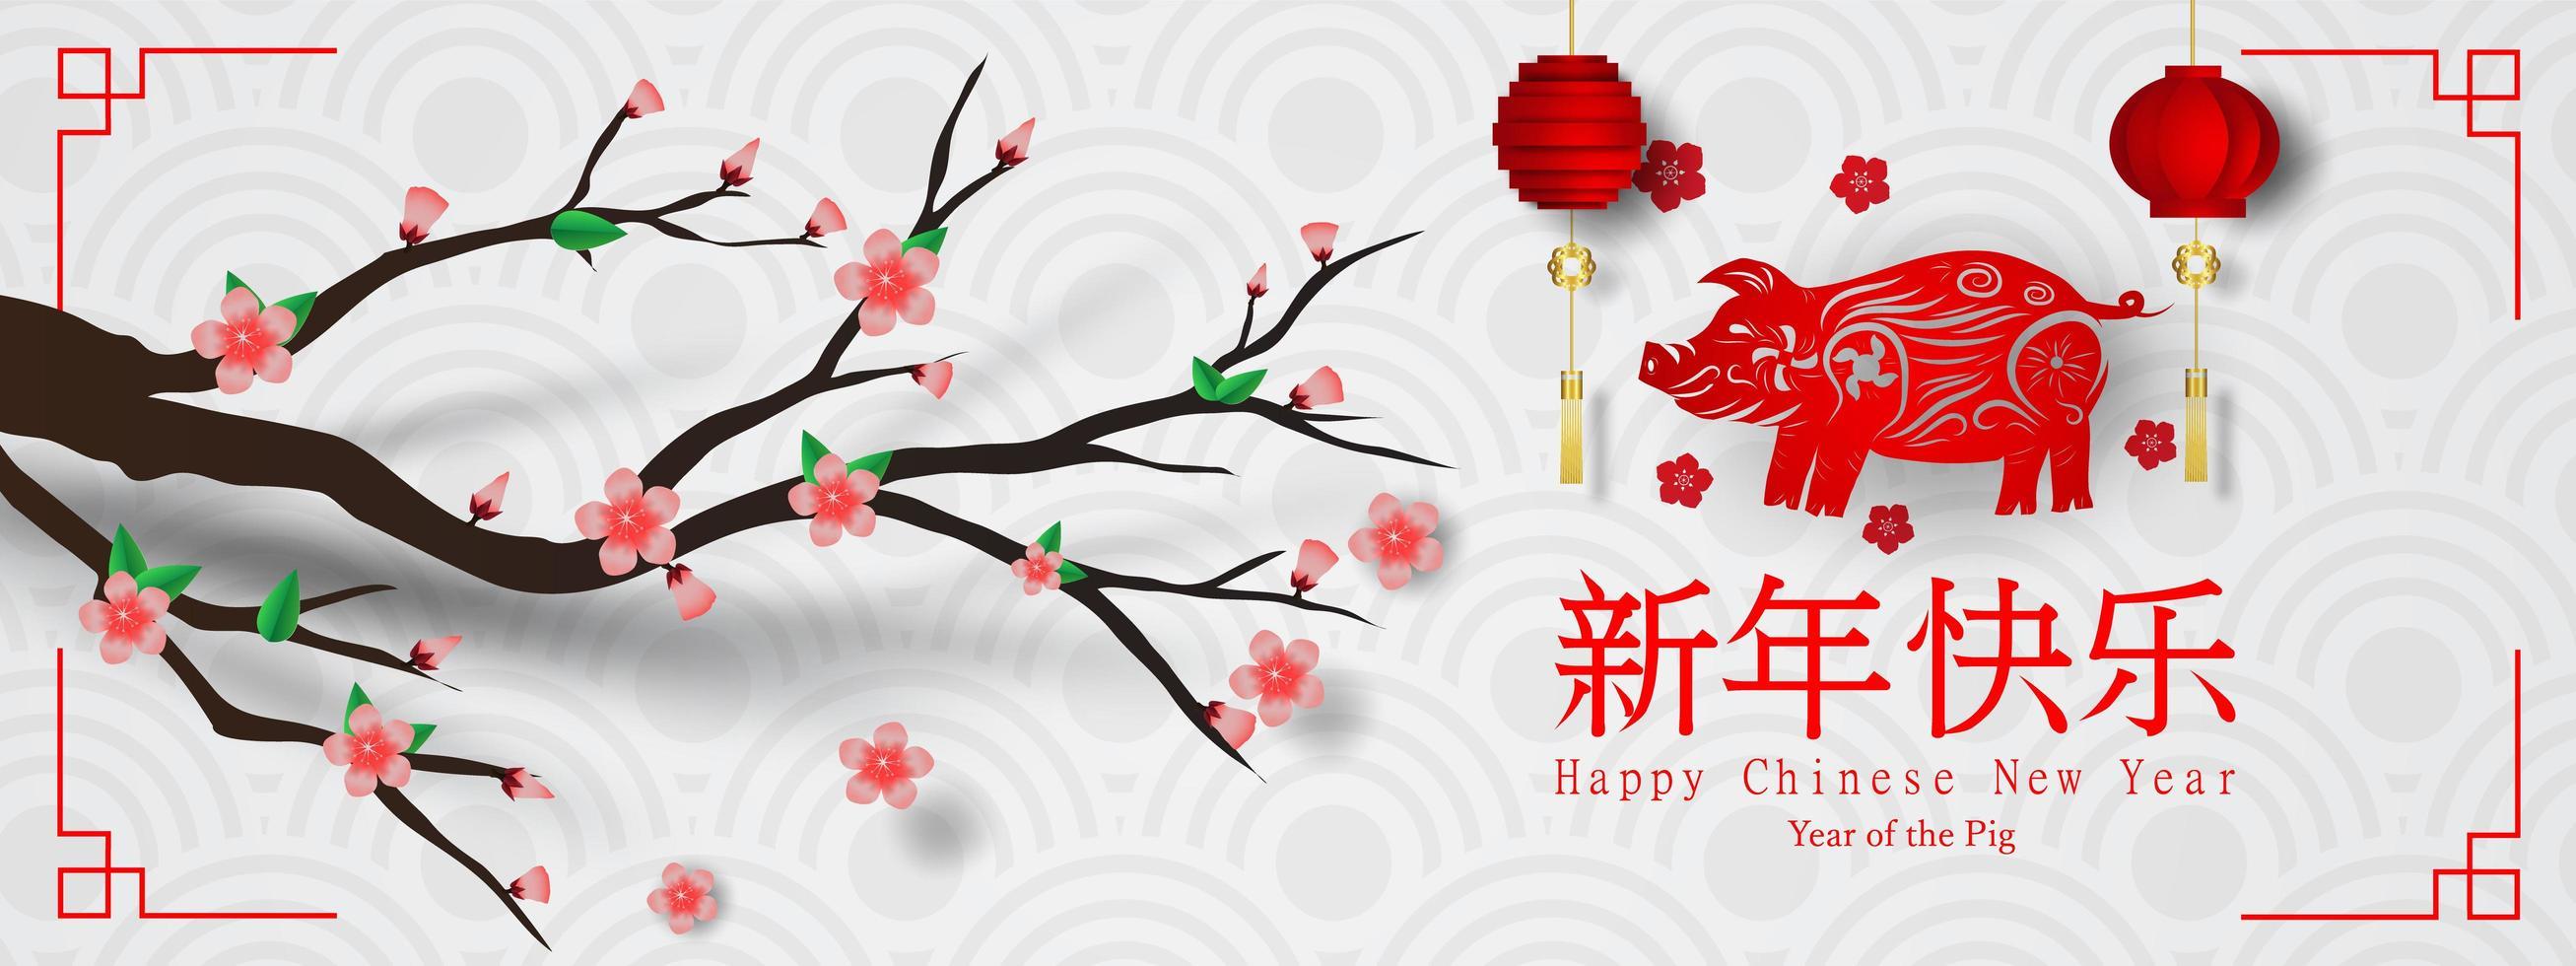 lyckligt kinesiskt nytt år av grisen asiatisk banner vektor